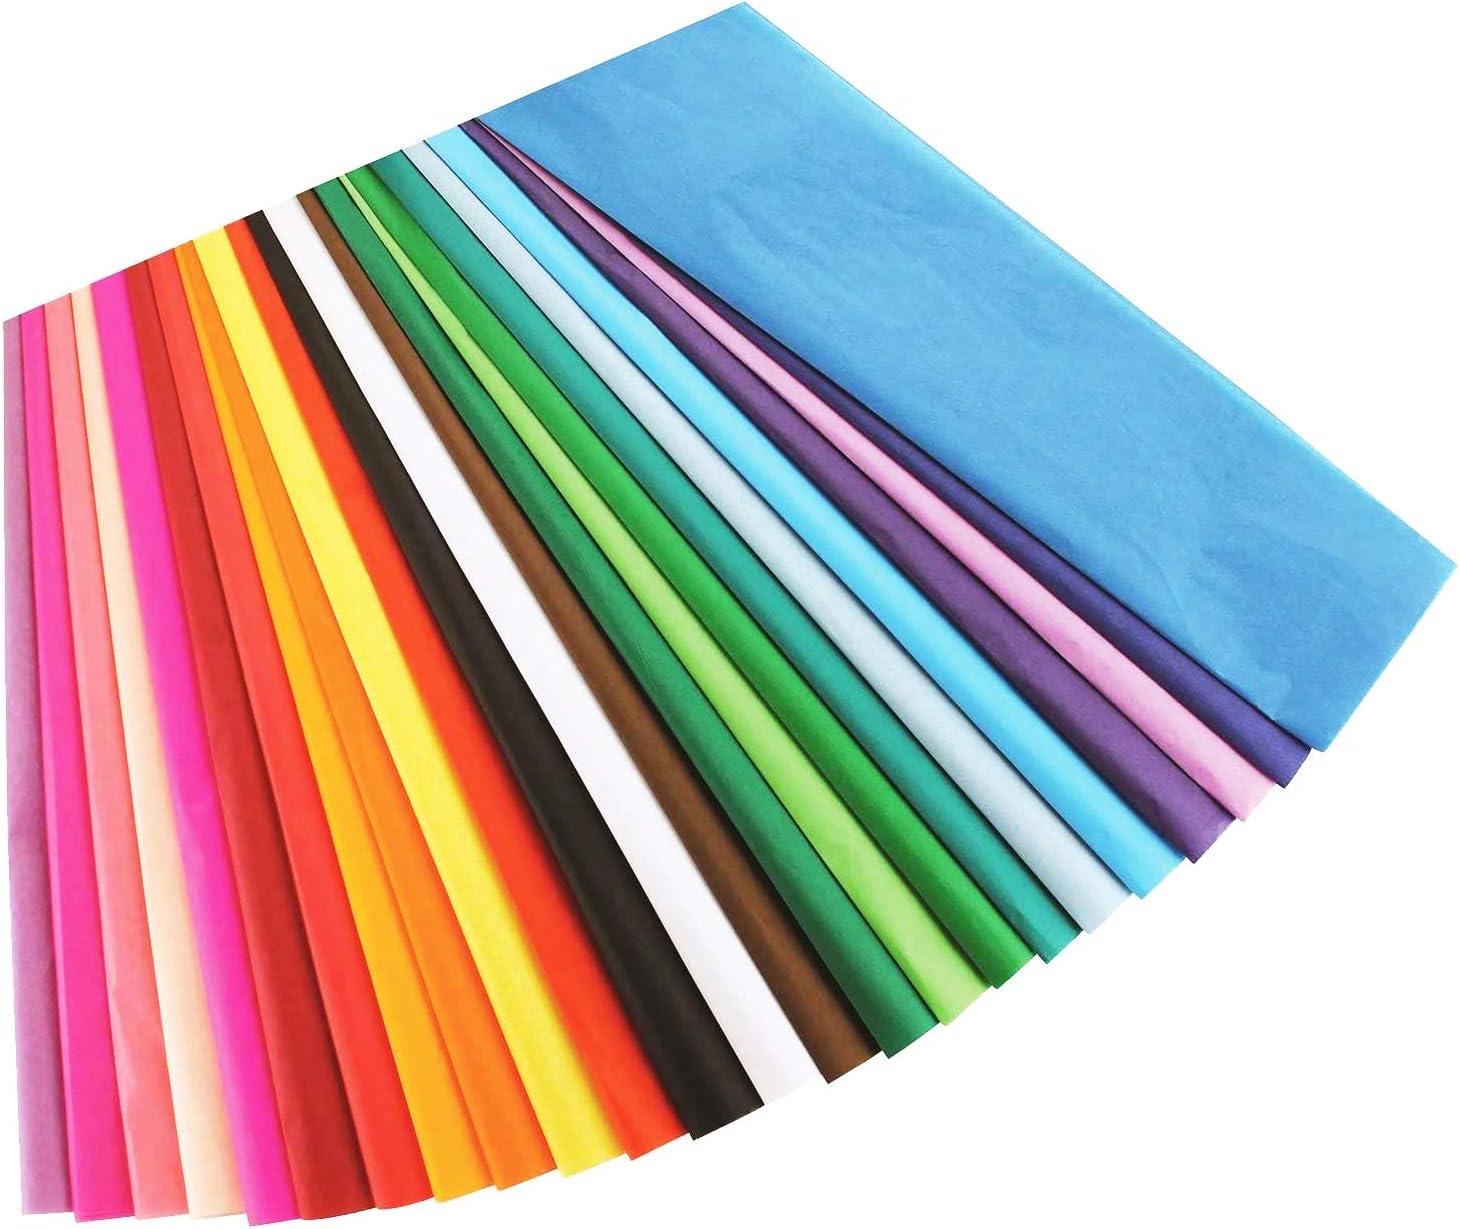 24 Sheets Pack 20 x 30 Cerise Pink Quality Premium Grade Color Tissue Paper